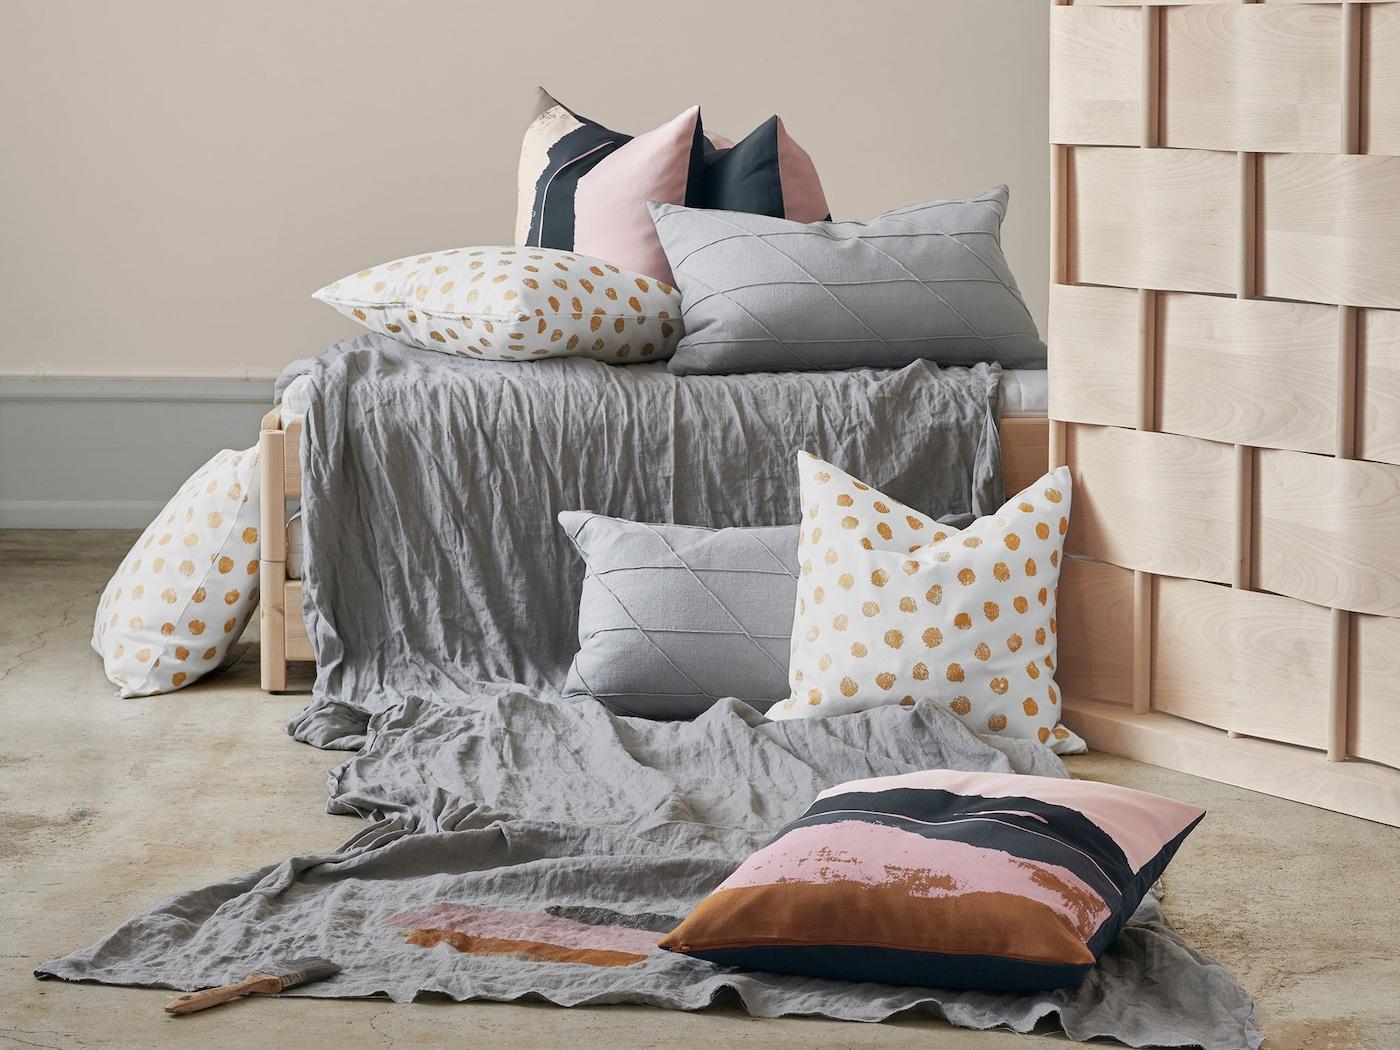 SKÄGGÖRT cushion cover with fun golden dots, and the ELDTÖREL cushion cover, plenty of mix cushions on the floor.